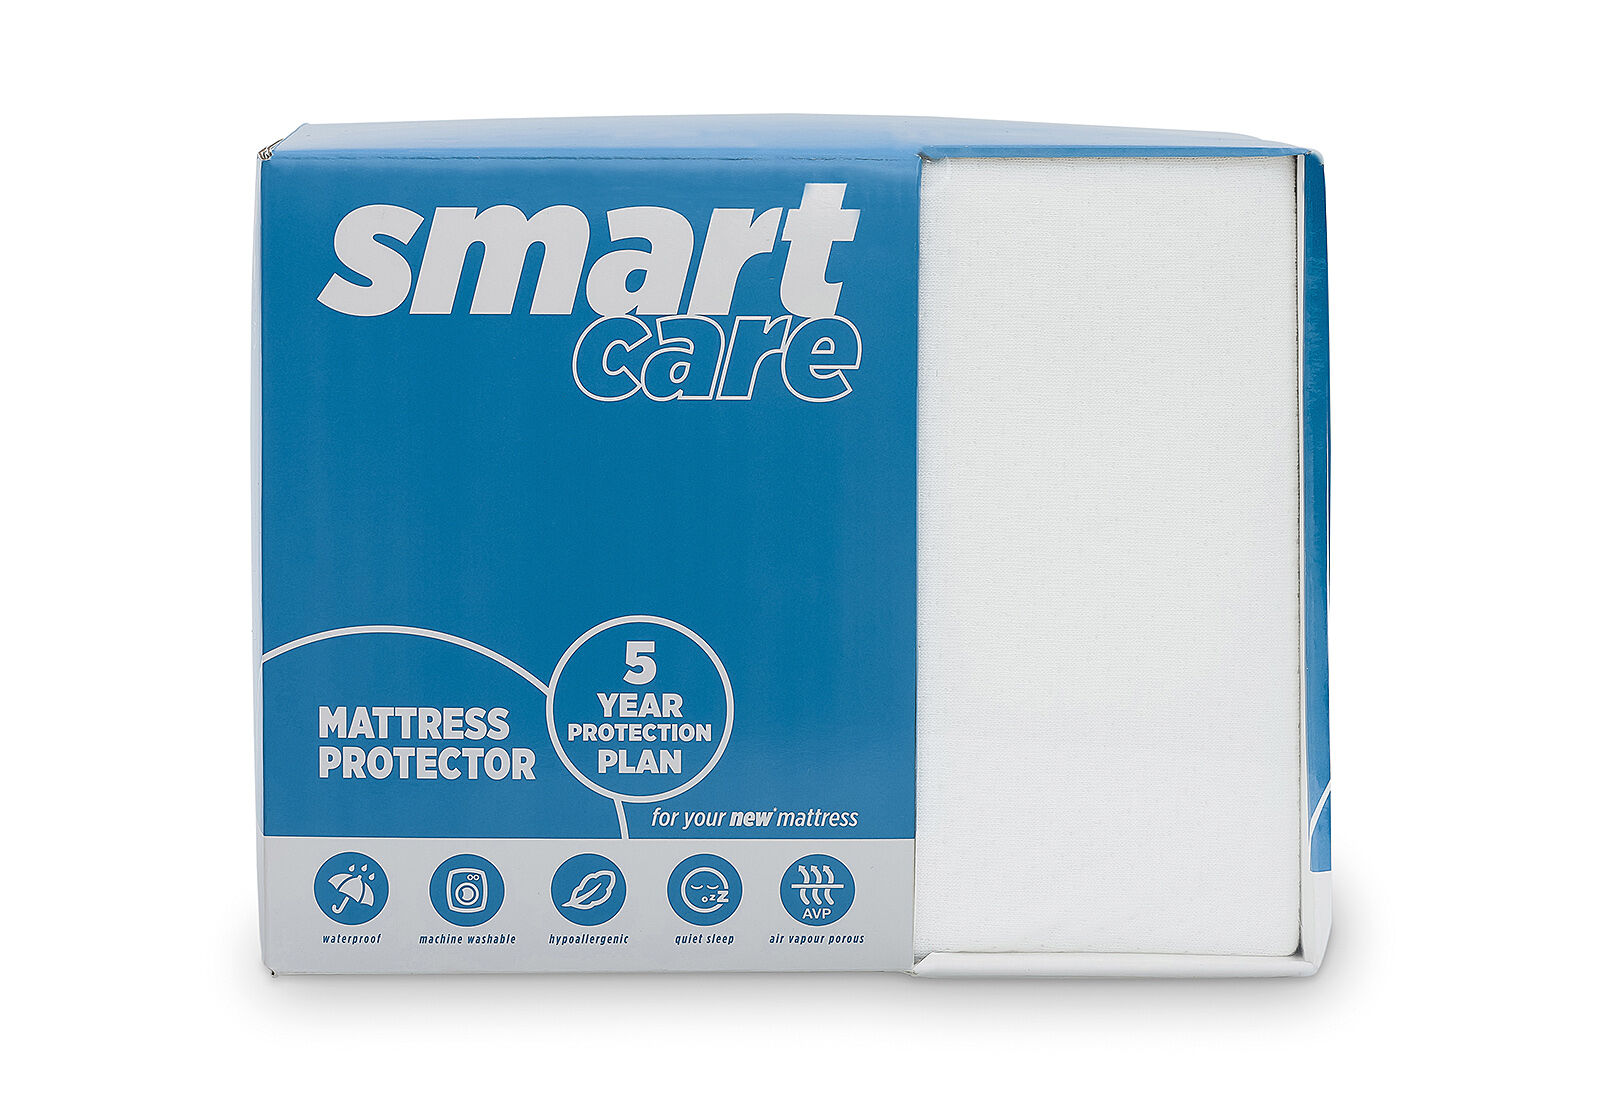 SMARTCARE MATTRESS PROTECTOR